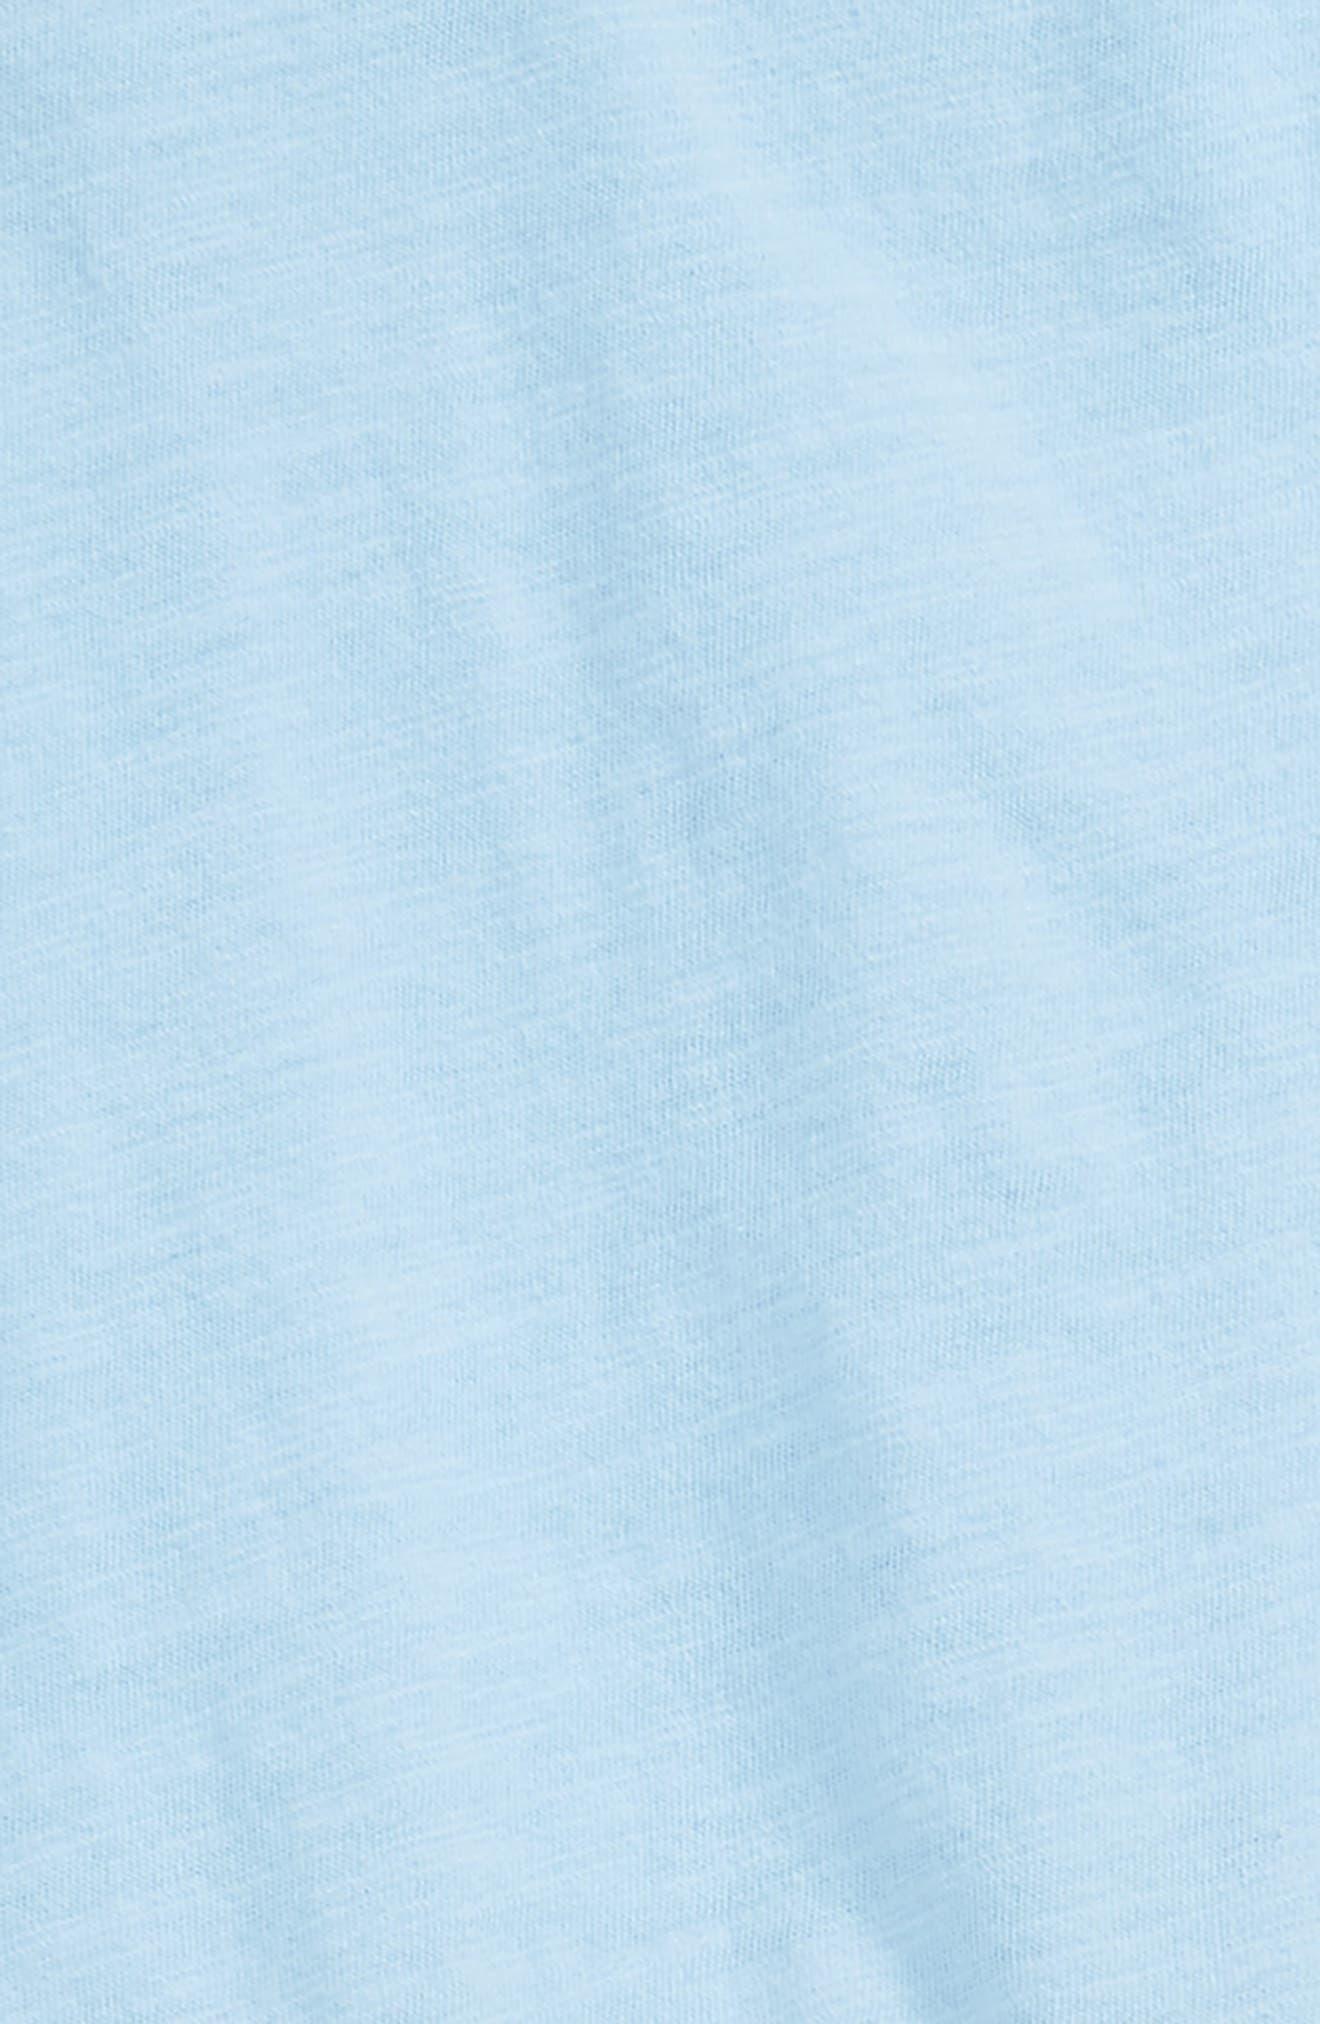 Dip Dye Top & Leggings Set,                             Alternate thumbnail 2, color,                             Blue Bell